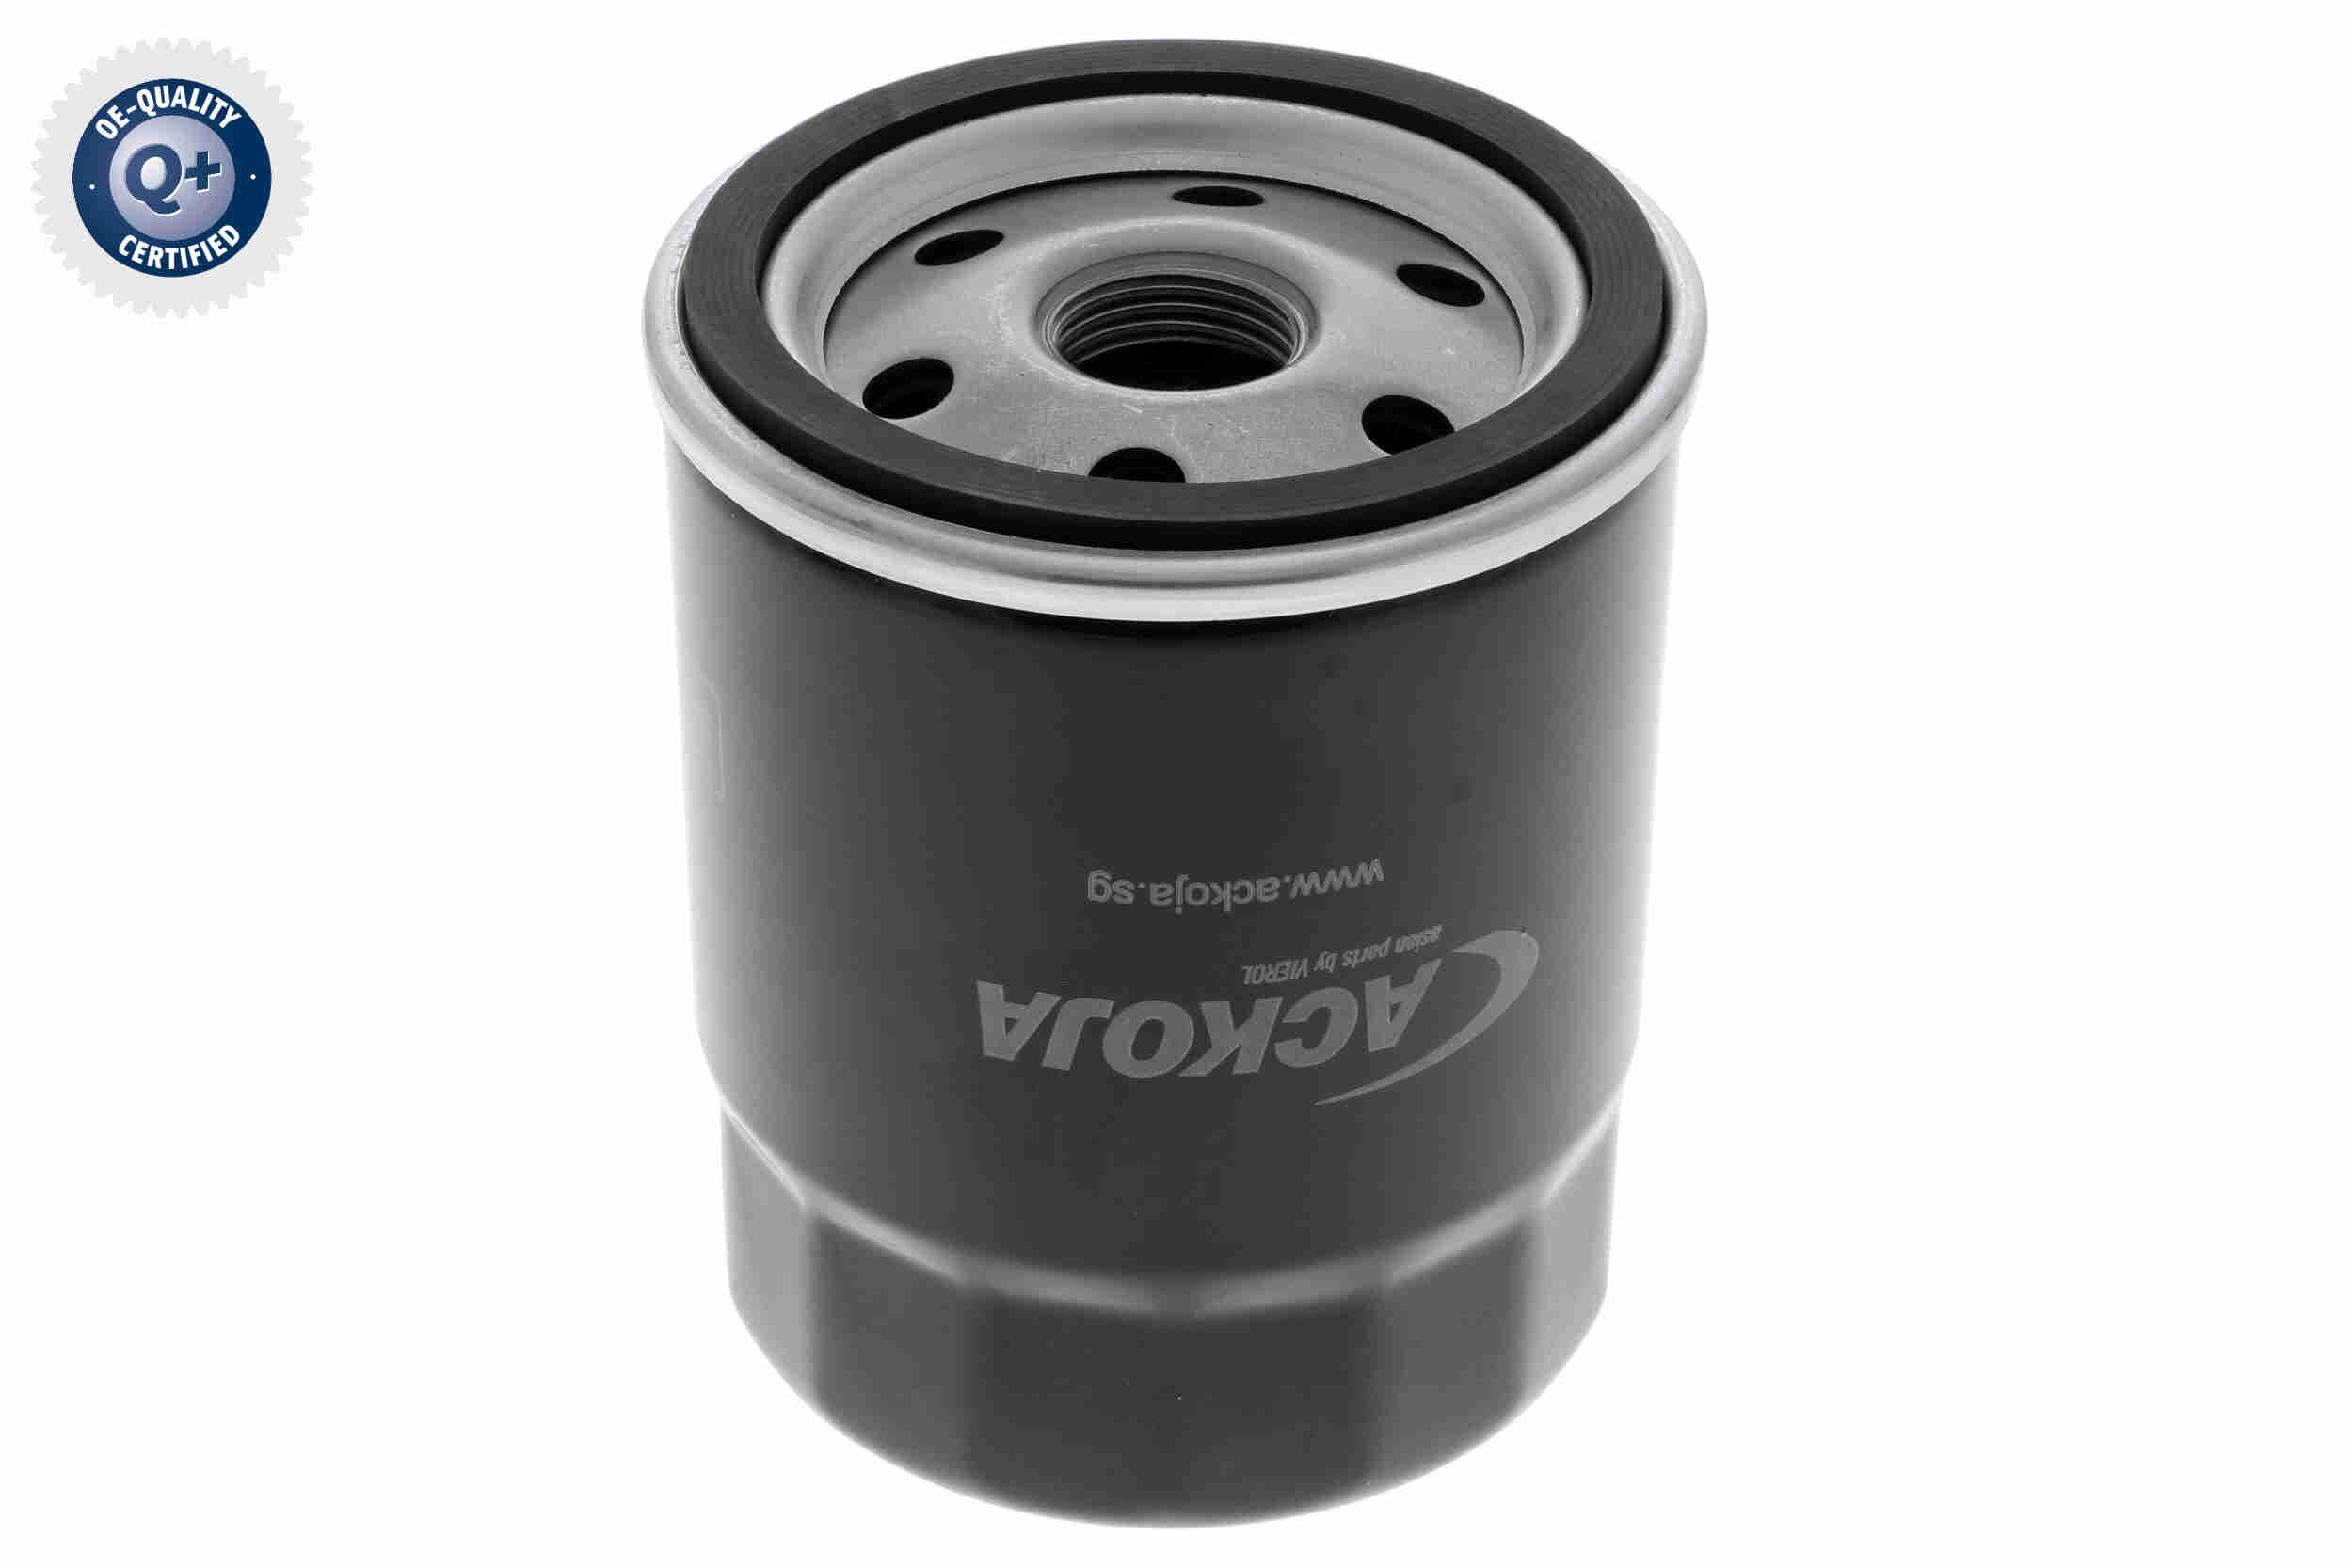 Motorölfilter A70-0503 ACKOJA A70-0503 in Original Qualität